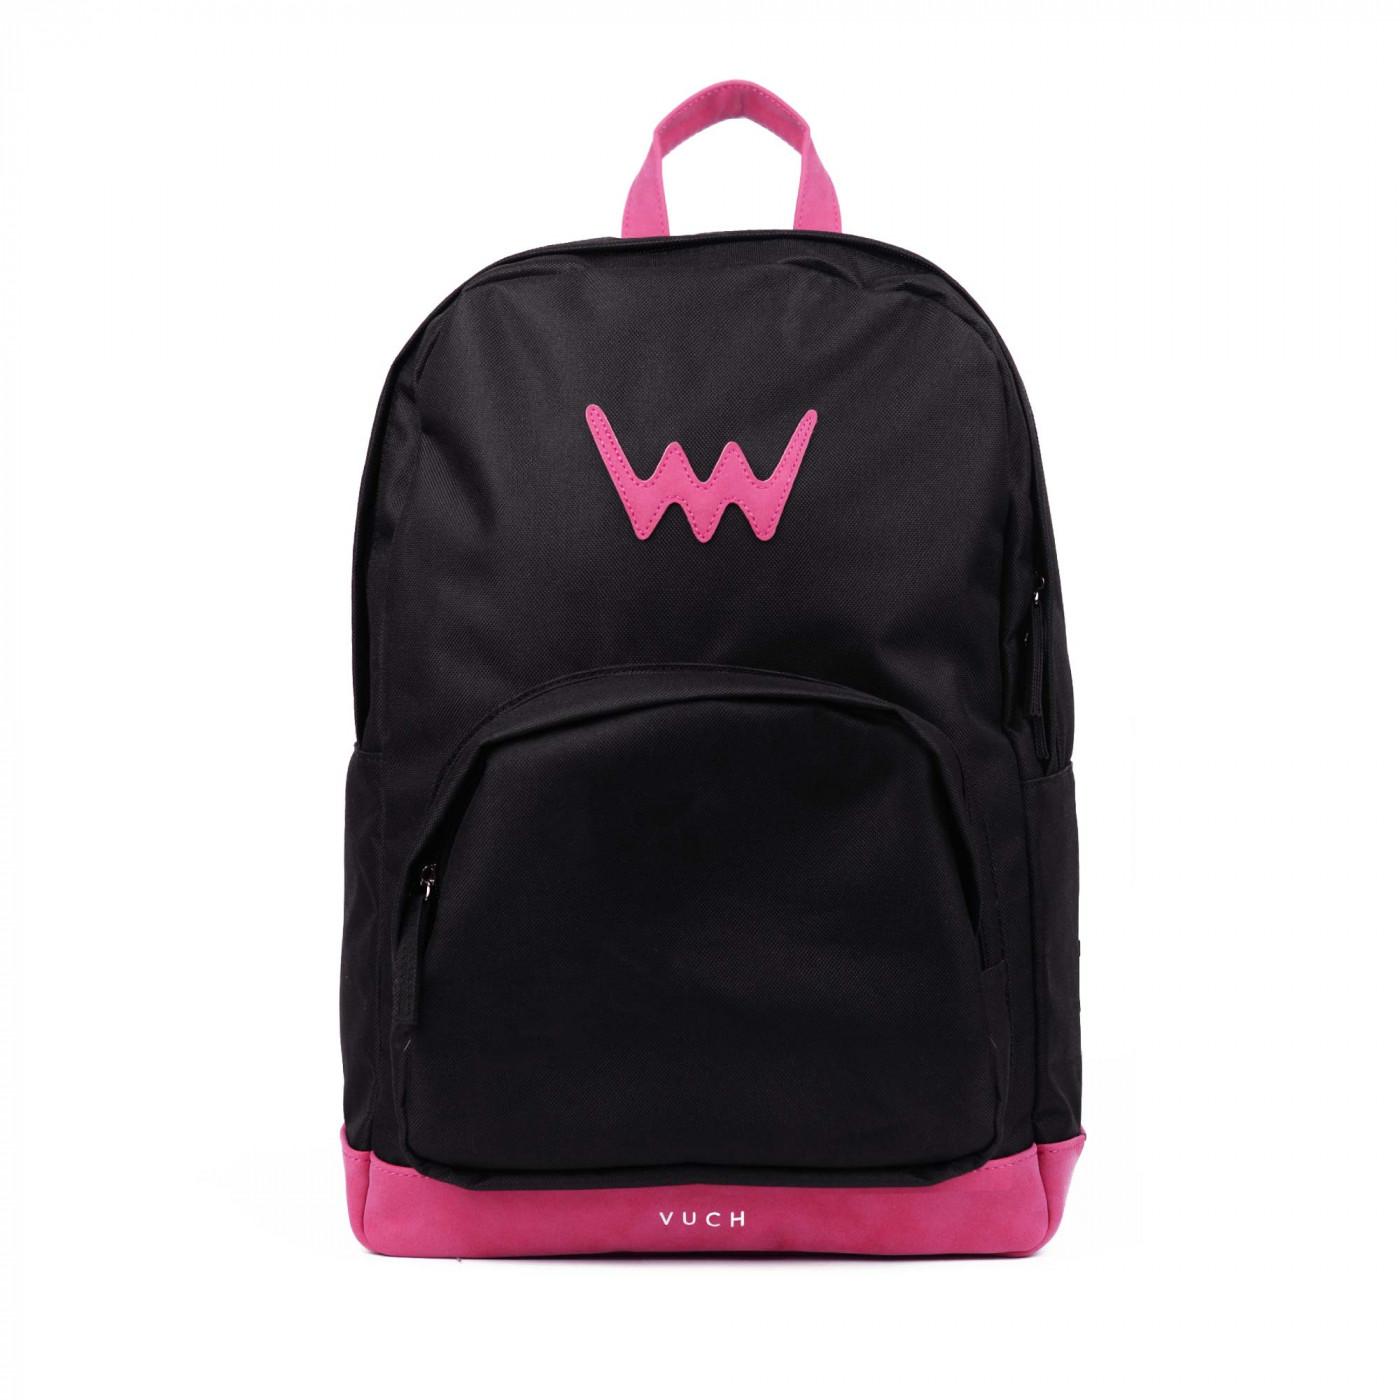 Women's backpack VUCH